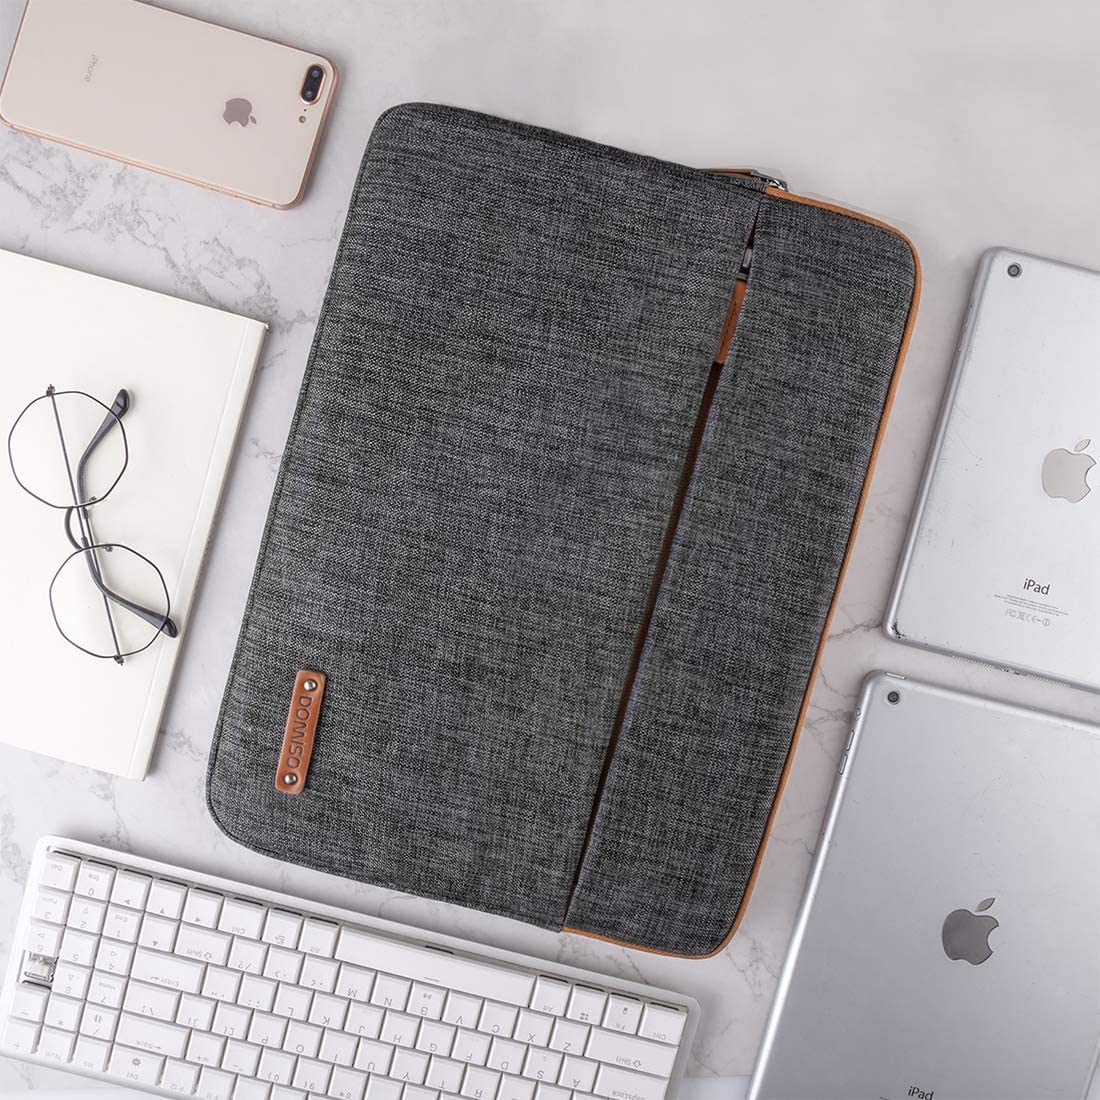 iPad Pro 10.5 Surface Go 2018 iPad Air 3 10.5 iPad 1//2//3//4//5//6,Lenovo Yoga Book DOMISO 10.1 Inch Tablet Sleeve Case Water Resistant Protective Cover for 9.7 10.5 11 iPad Pro Dark Grey